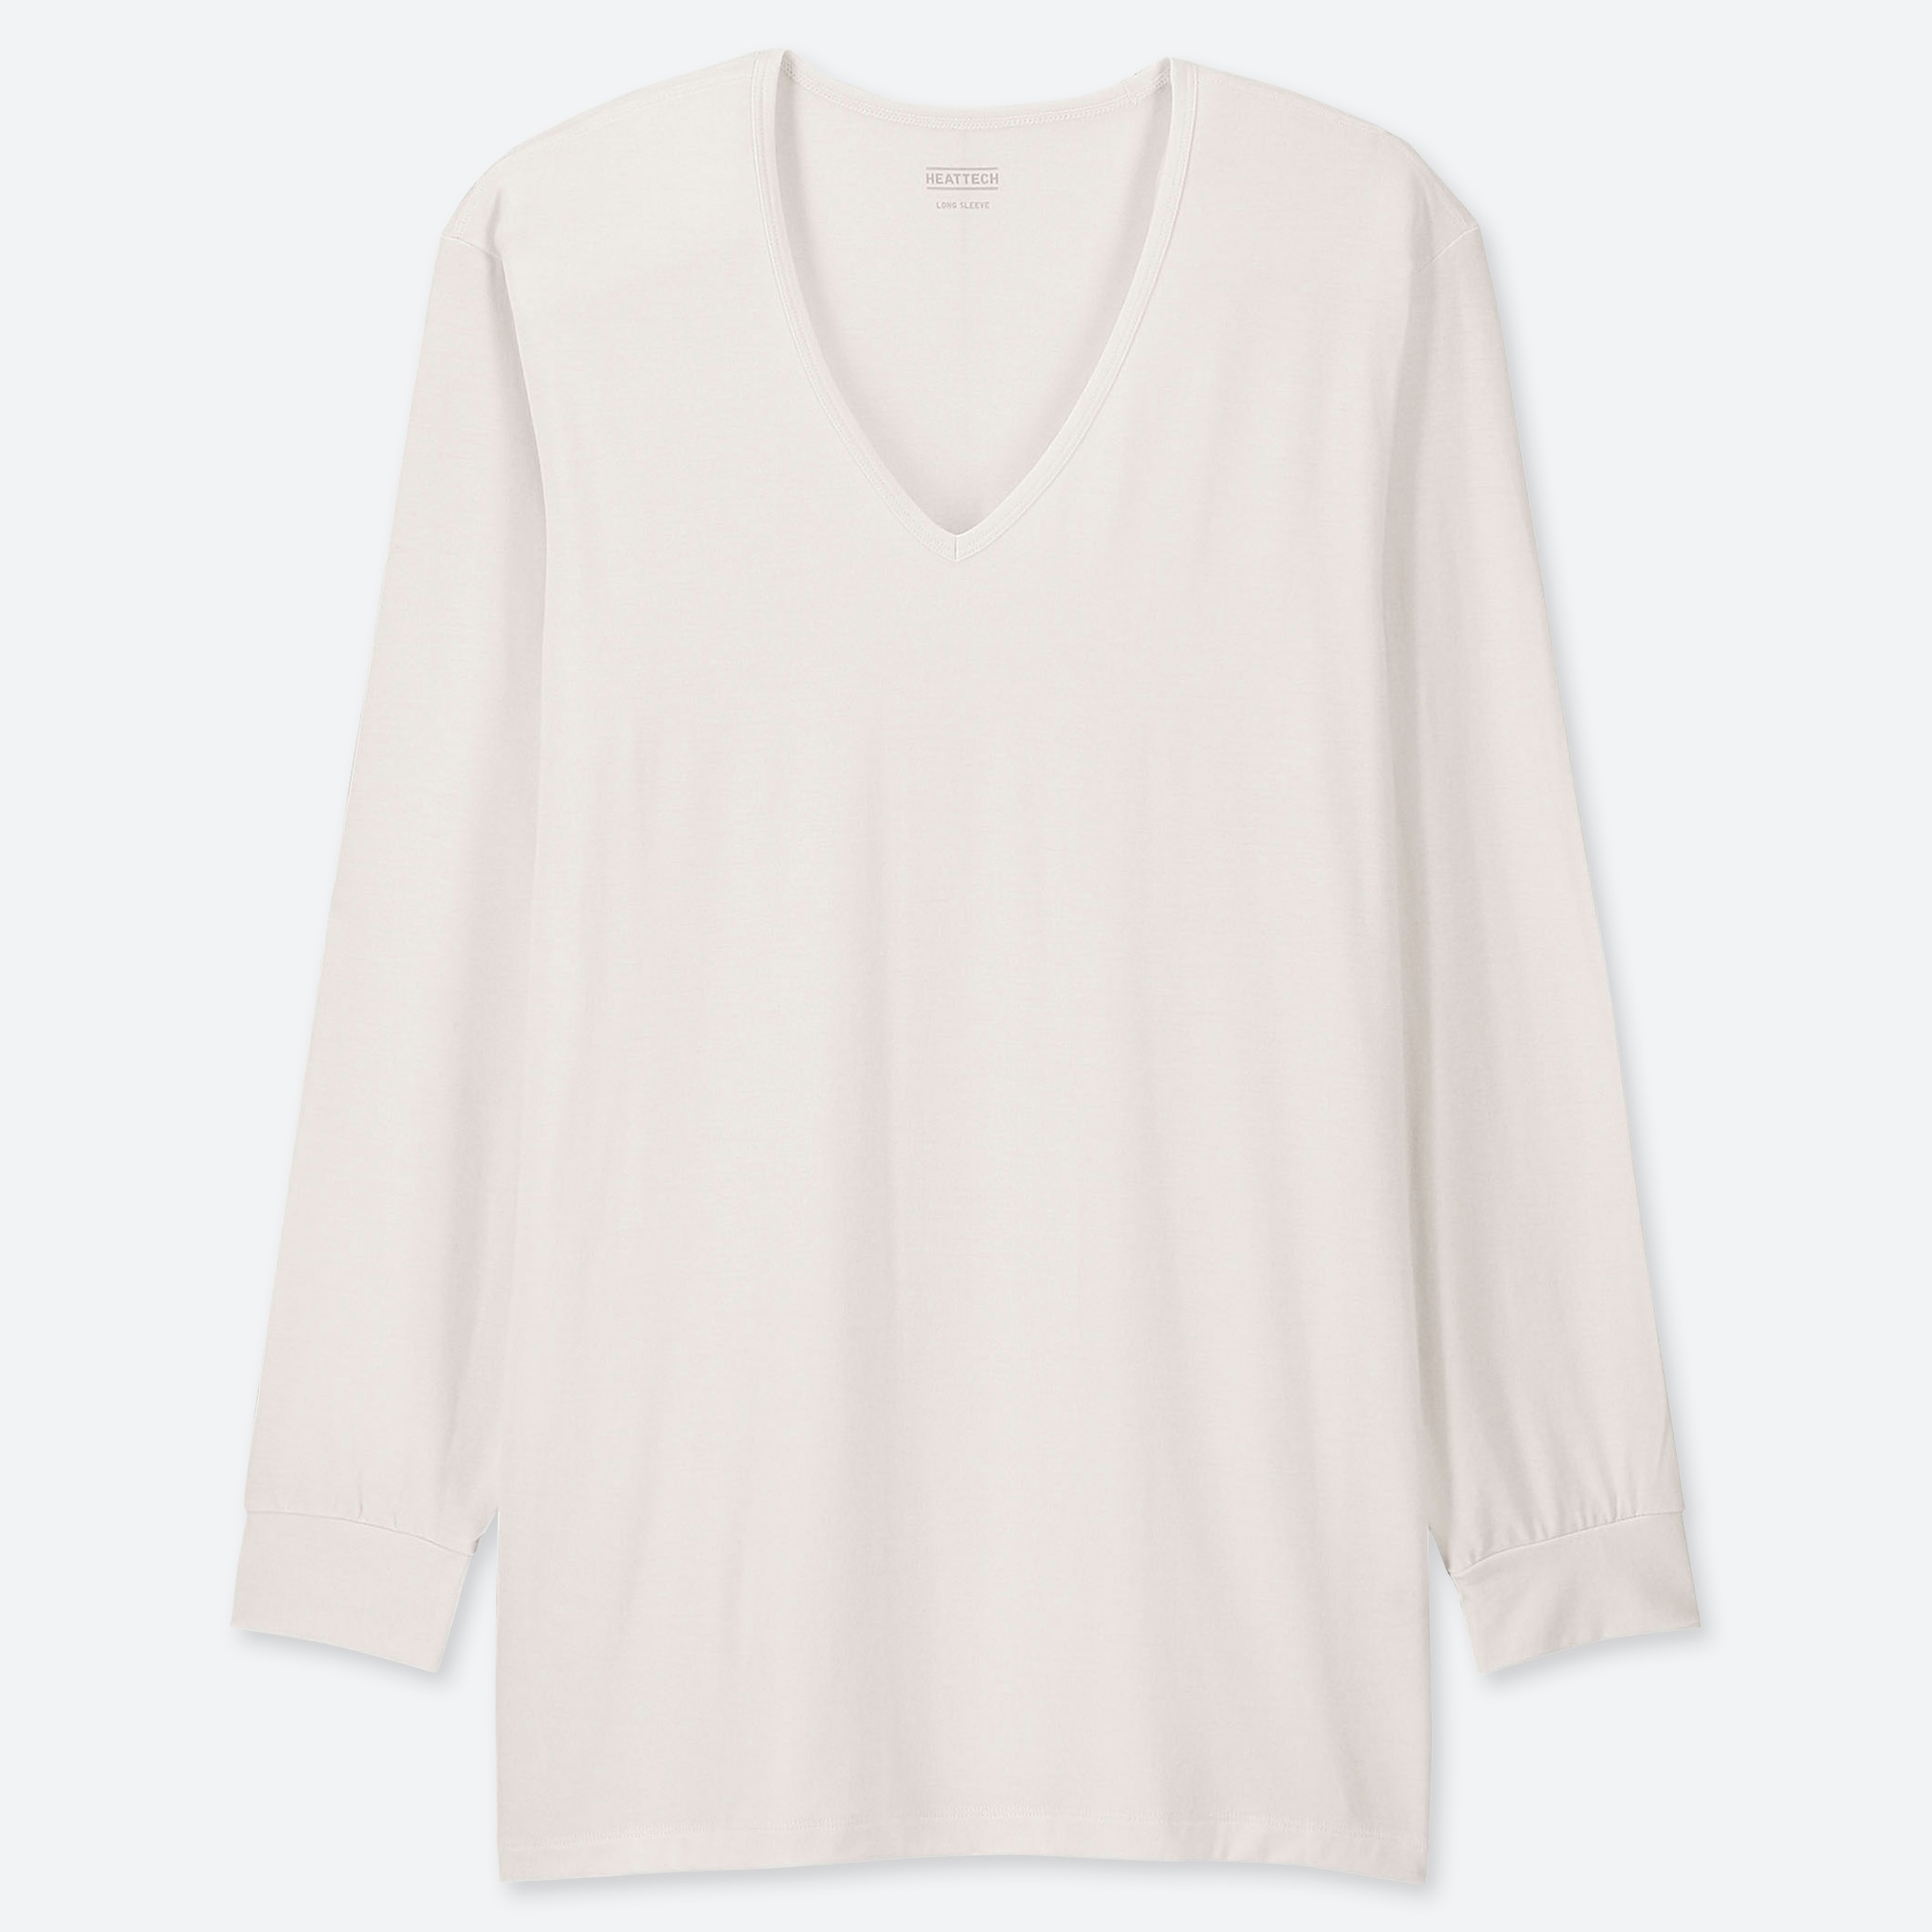 Uniqlo Uniqlo men heattech v-neck long-sleeve t-shirt